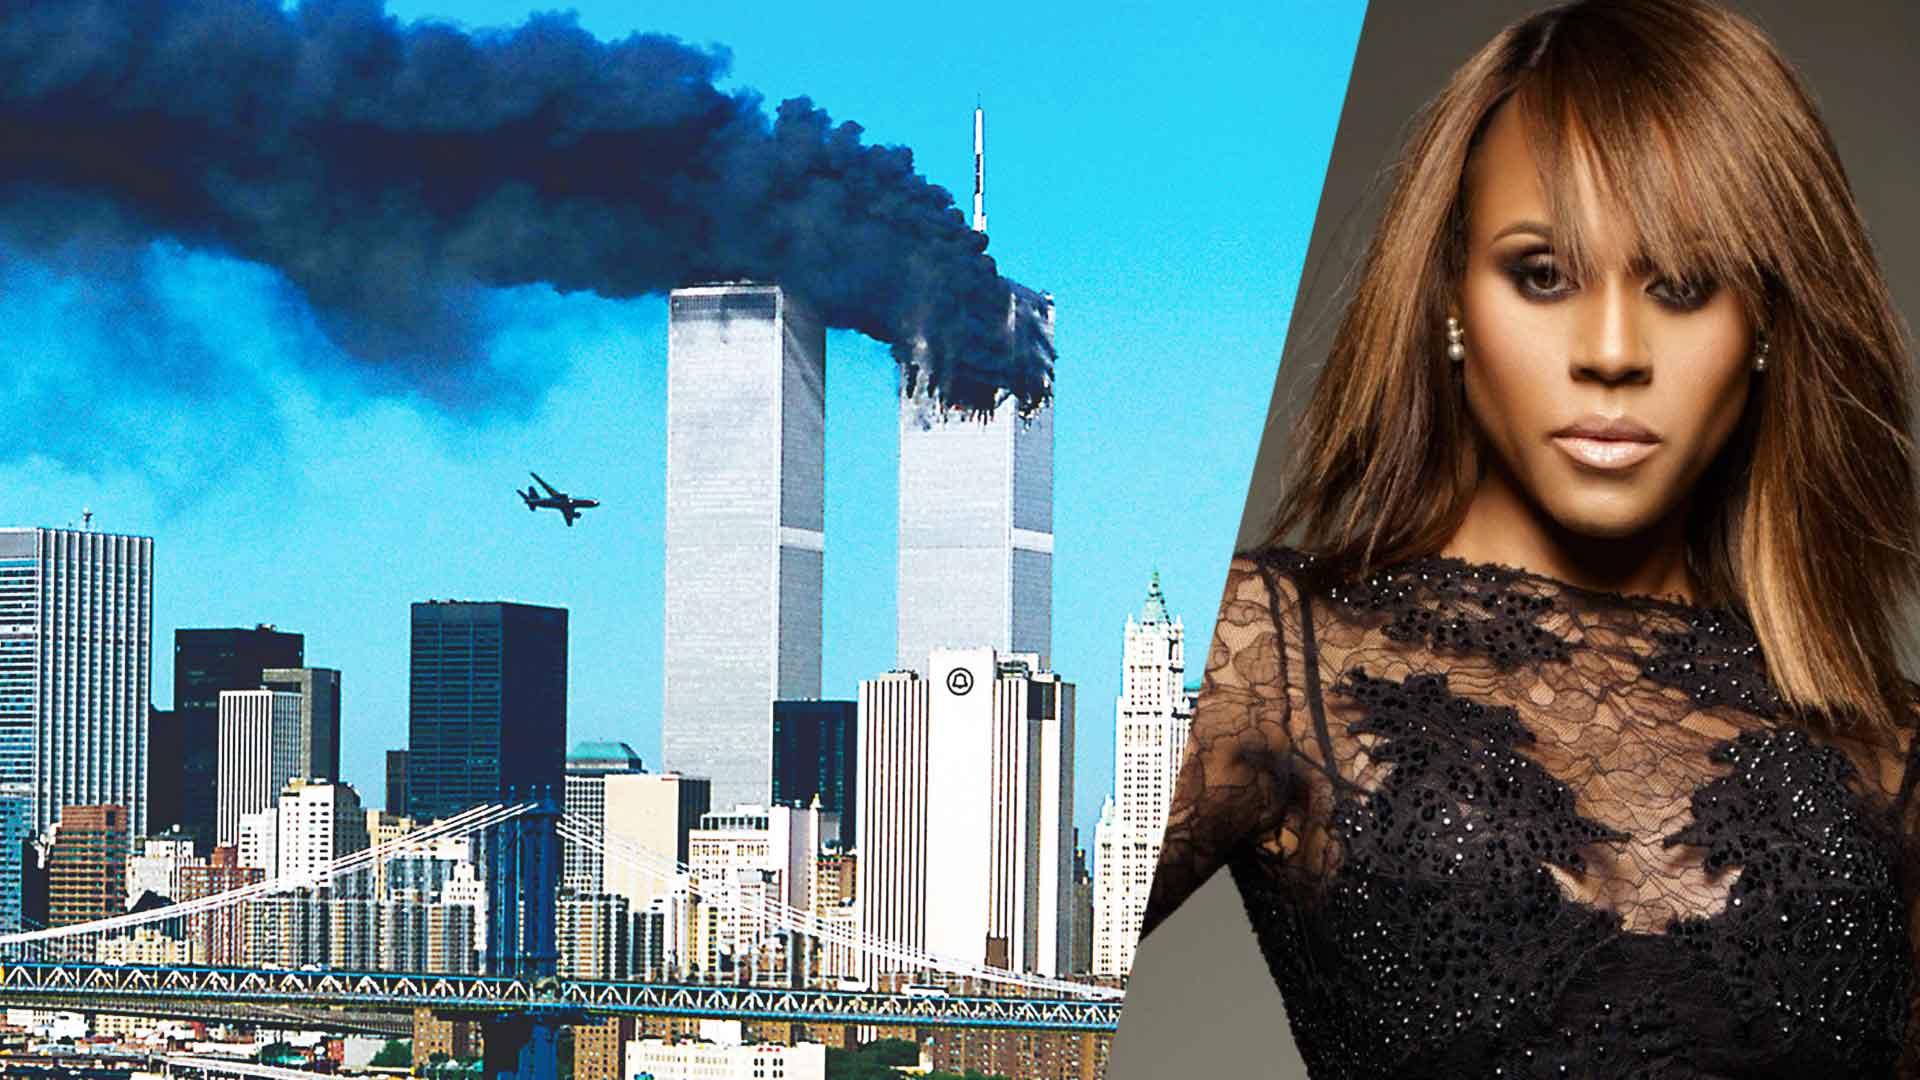 9-11-2021-DEBORAH-COX-RECALLS-911-EXPERIENCE-AFTER-MICHAEL-JACKSON-CONCERT